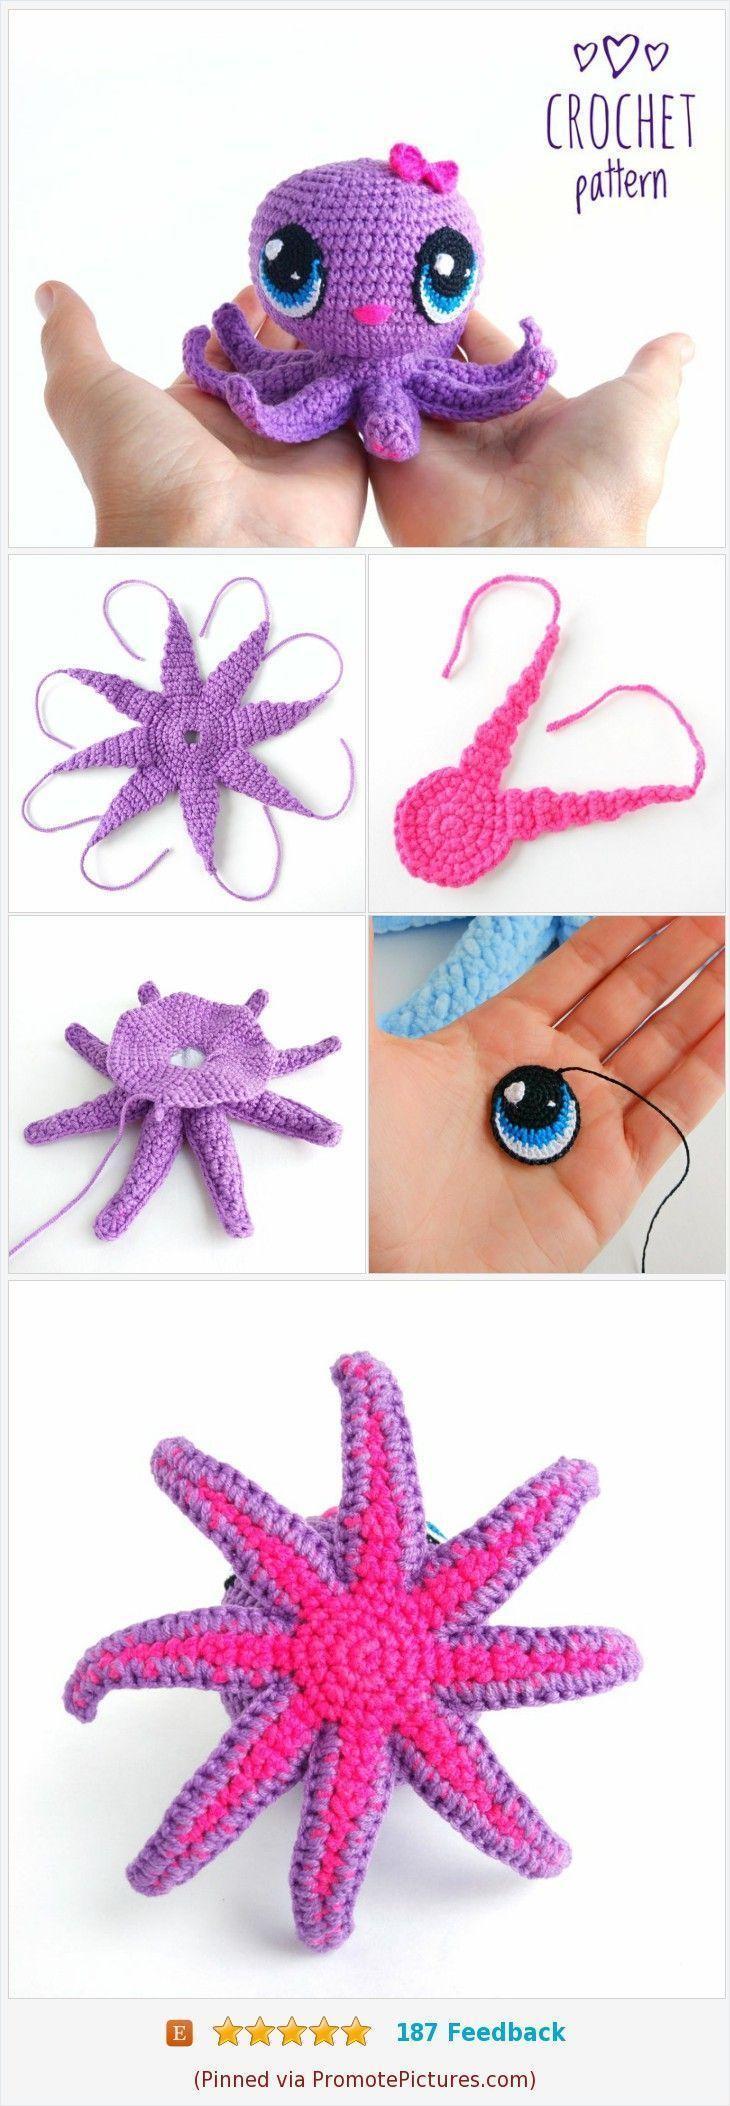 Photo of CROCHET OCTOPUS PATTERN – Amigurumi Octopus mit großen Augen – Häkelanleitung …